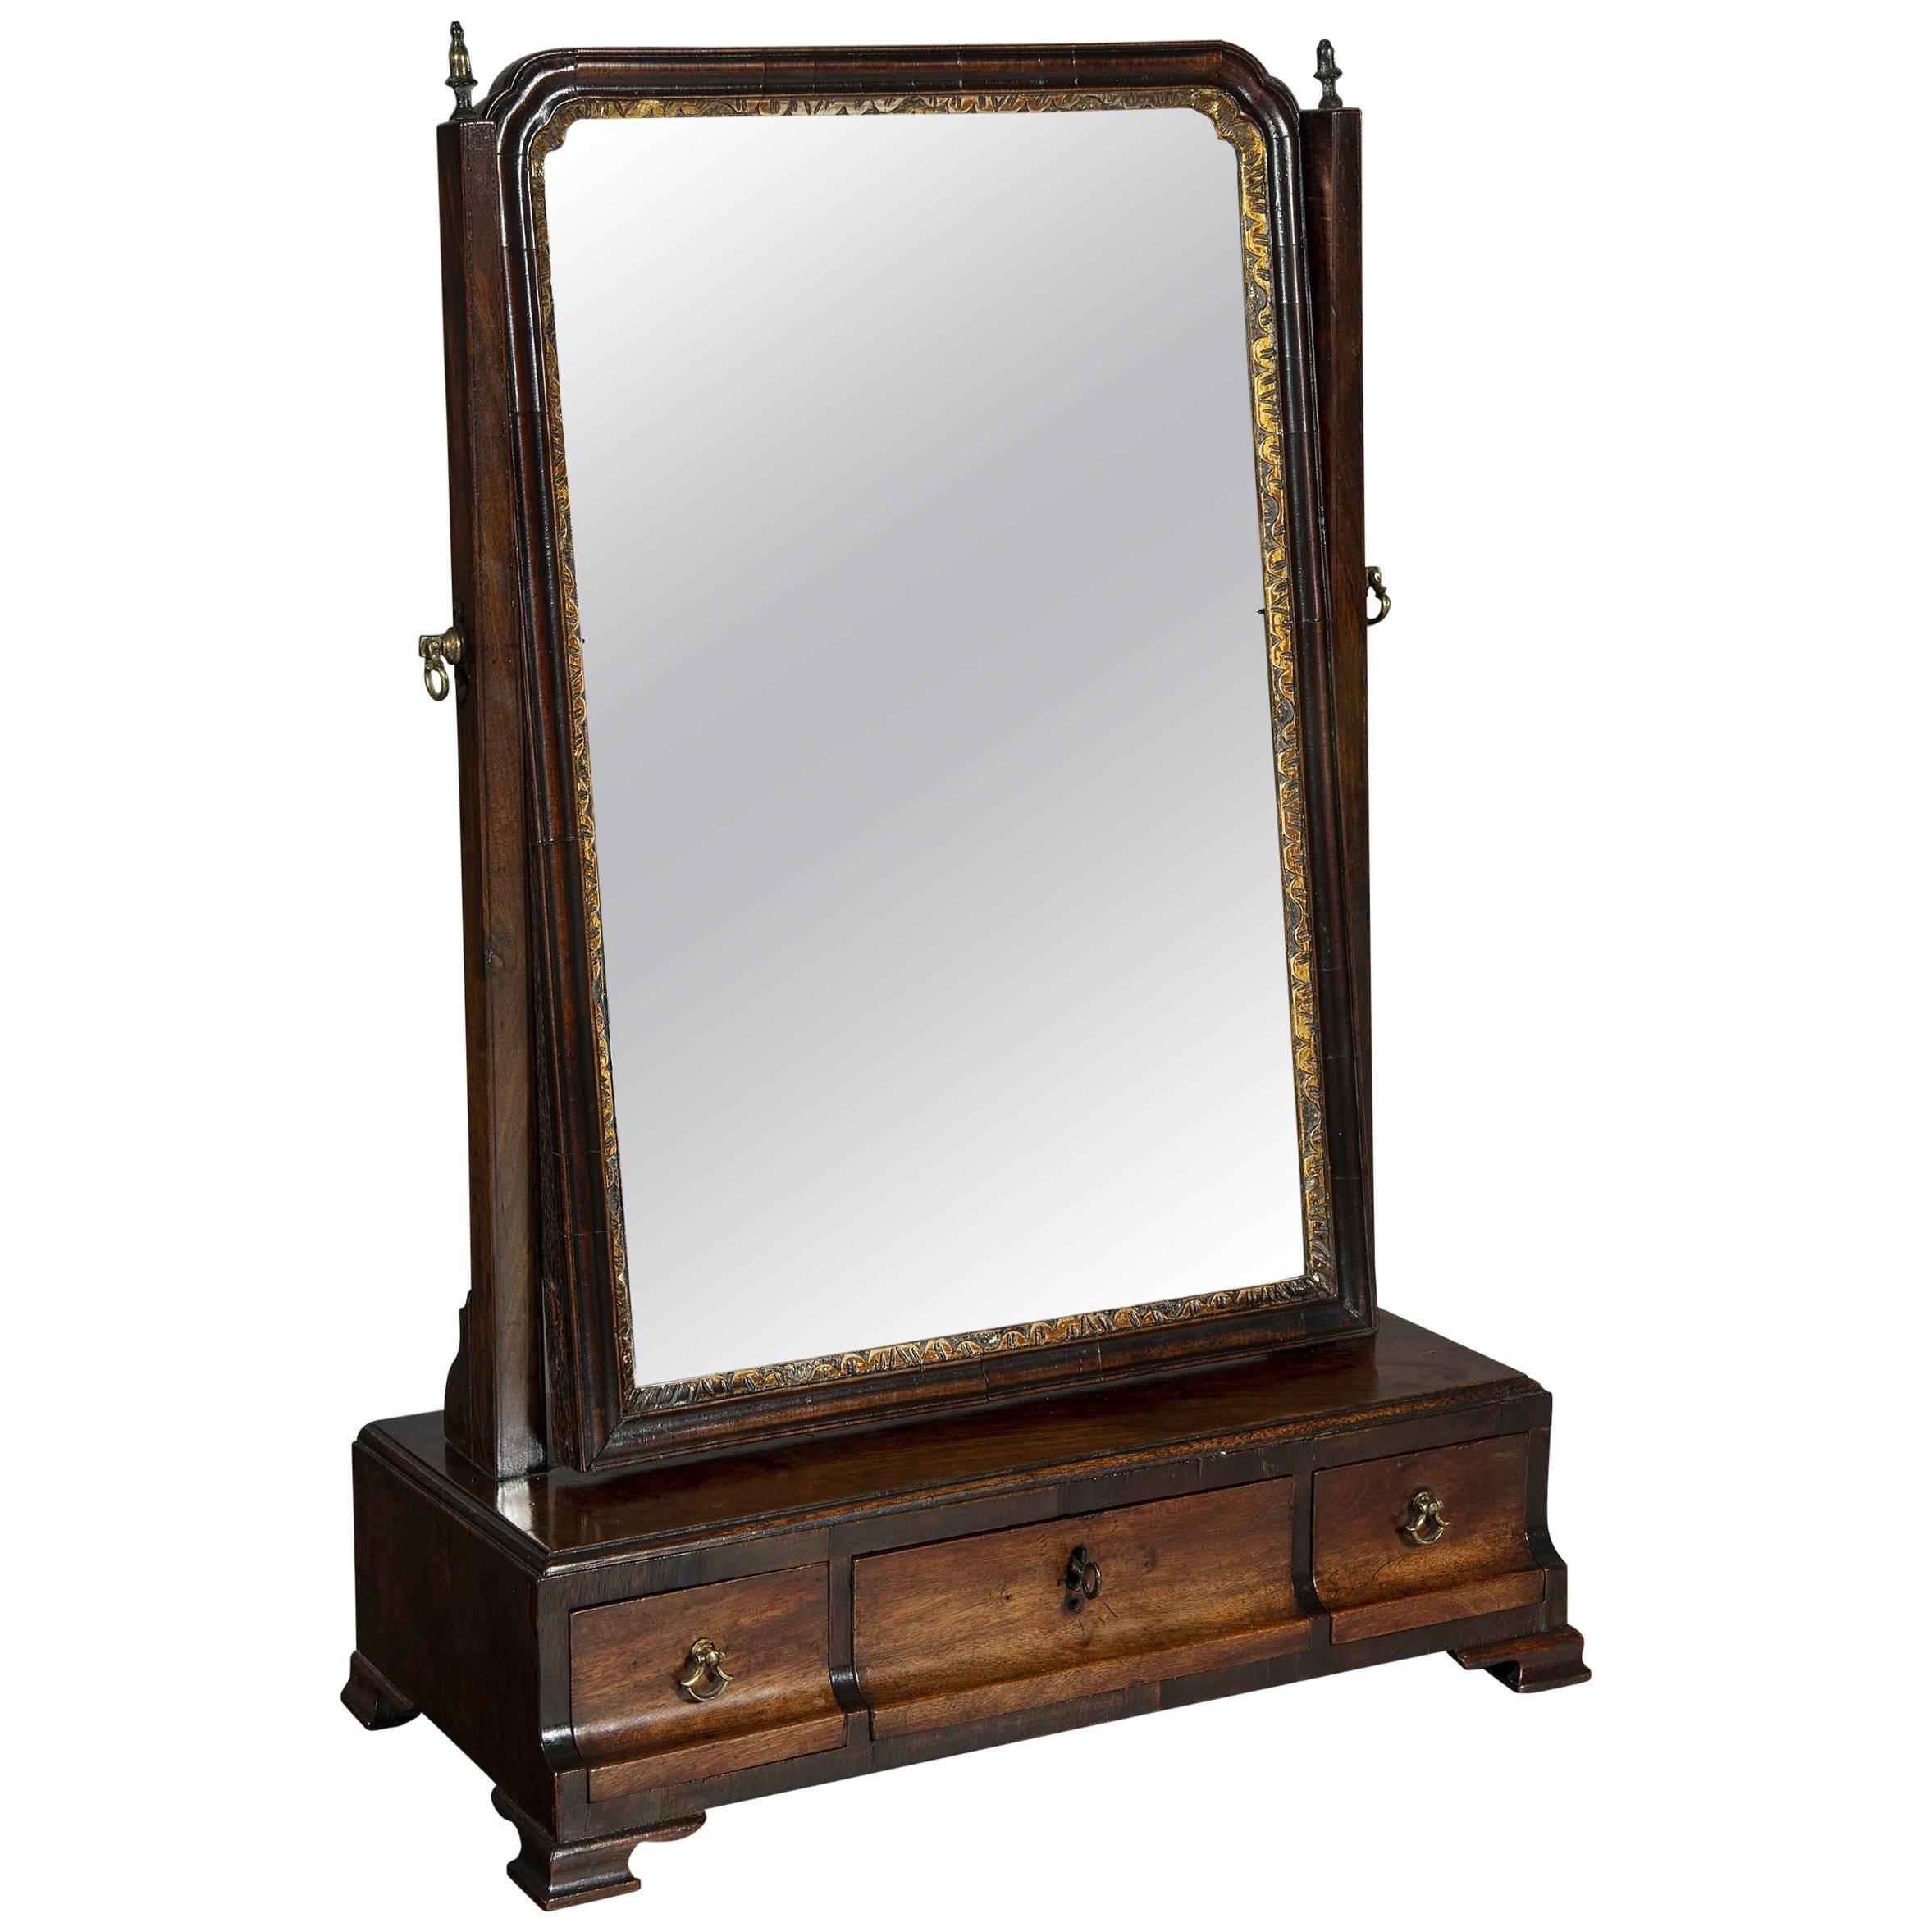 Art Deco Dressing Table Illuminated Vanity Mirror, Usa, Circa 1930 For